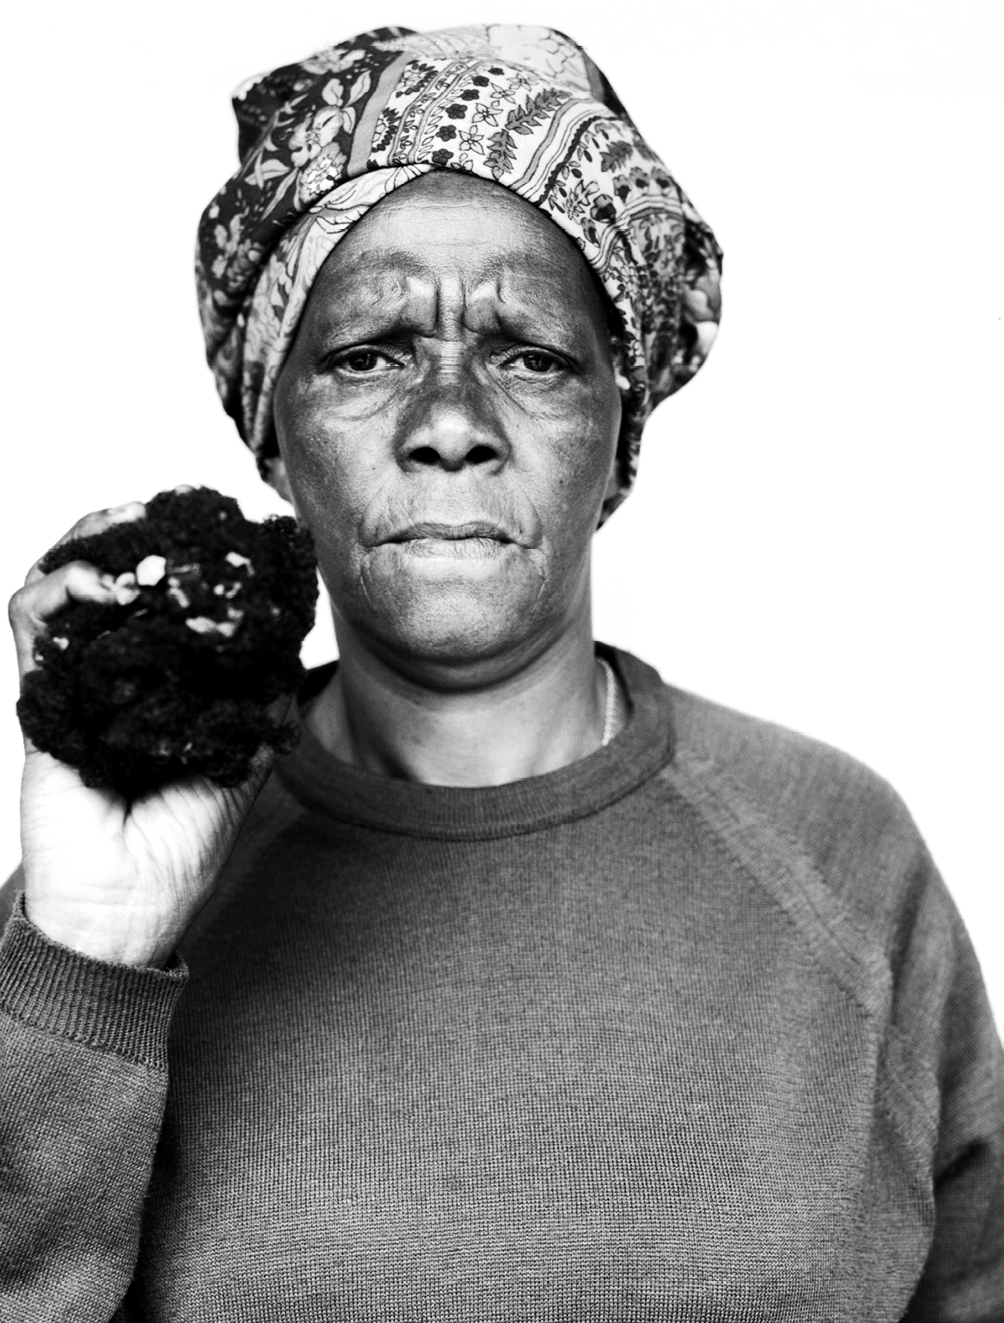 Jillian Edelstein, Joyce Mtimkulu, 1997, photographie.